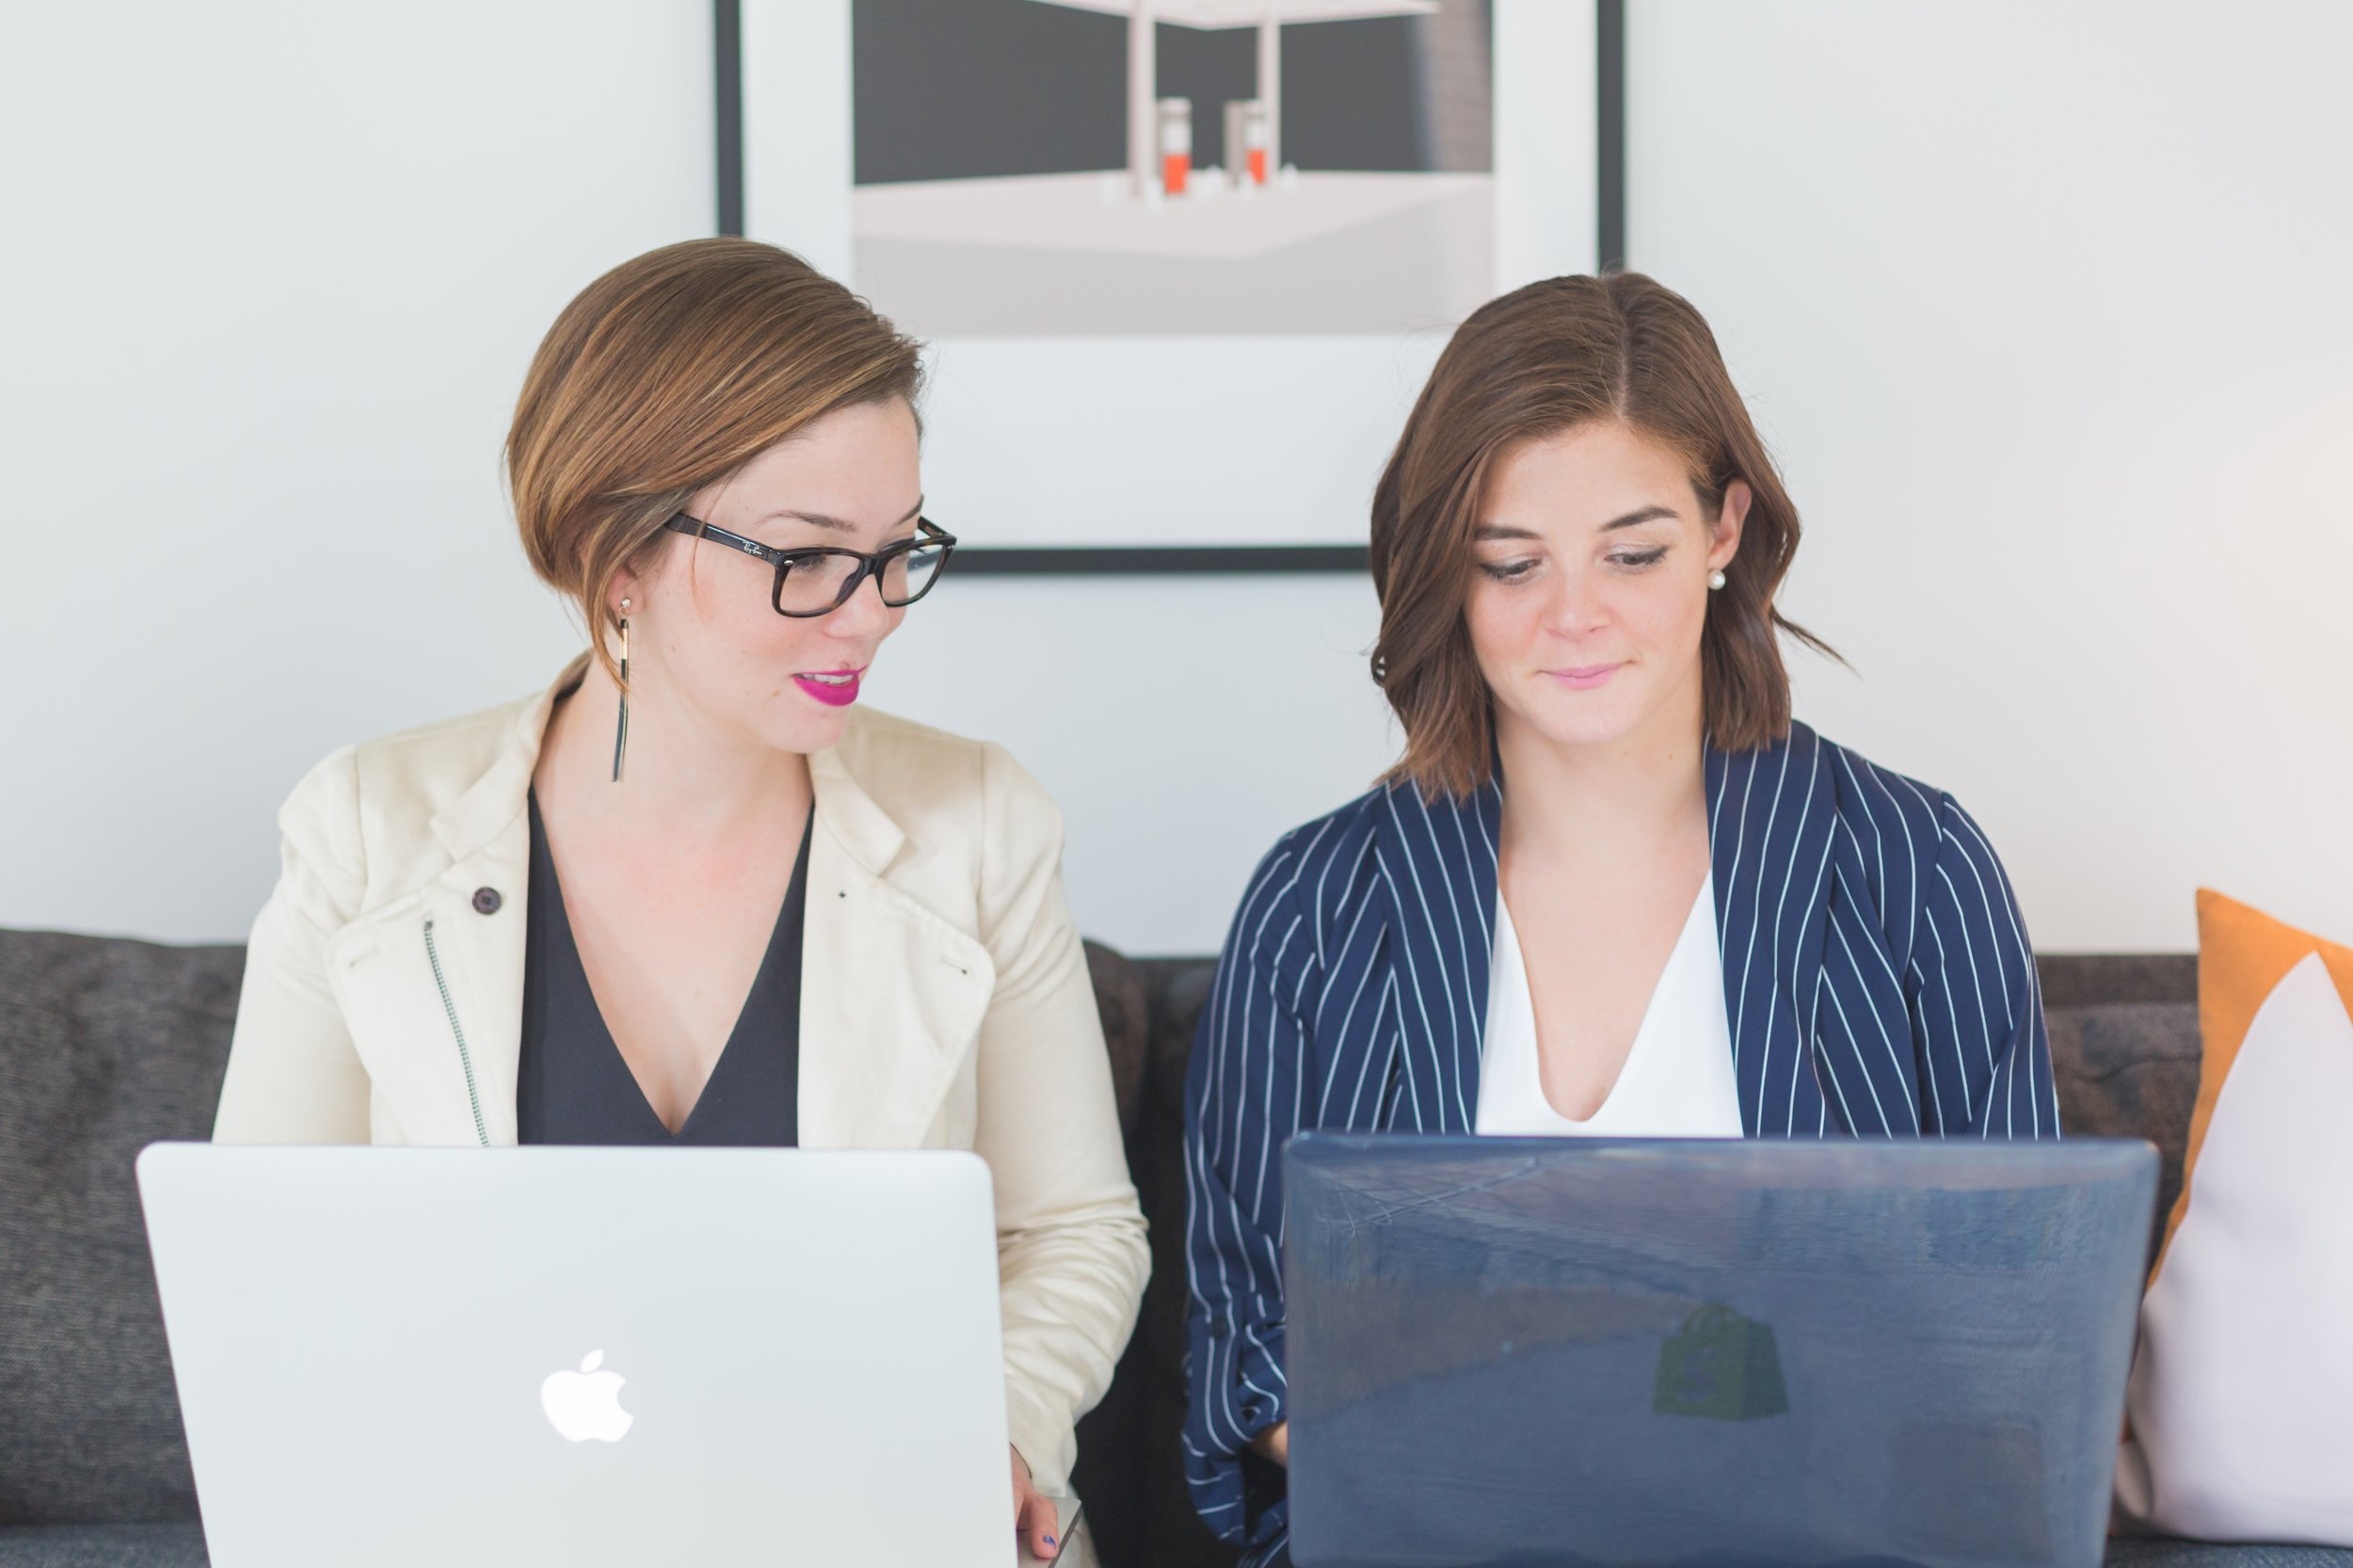 business-woman-meet-with-laptops_4460x4460.jpg